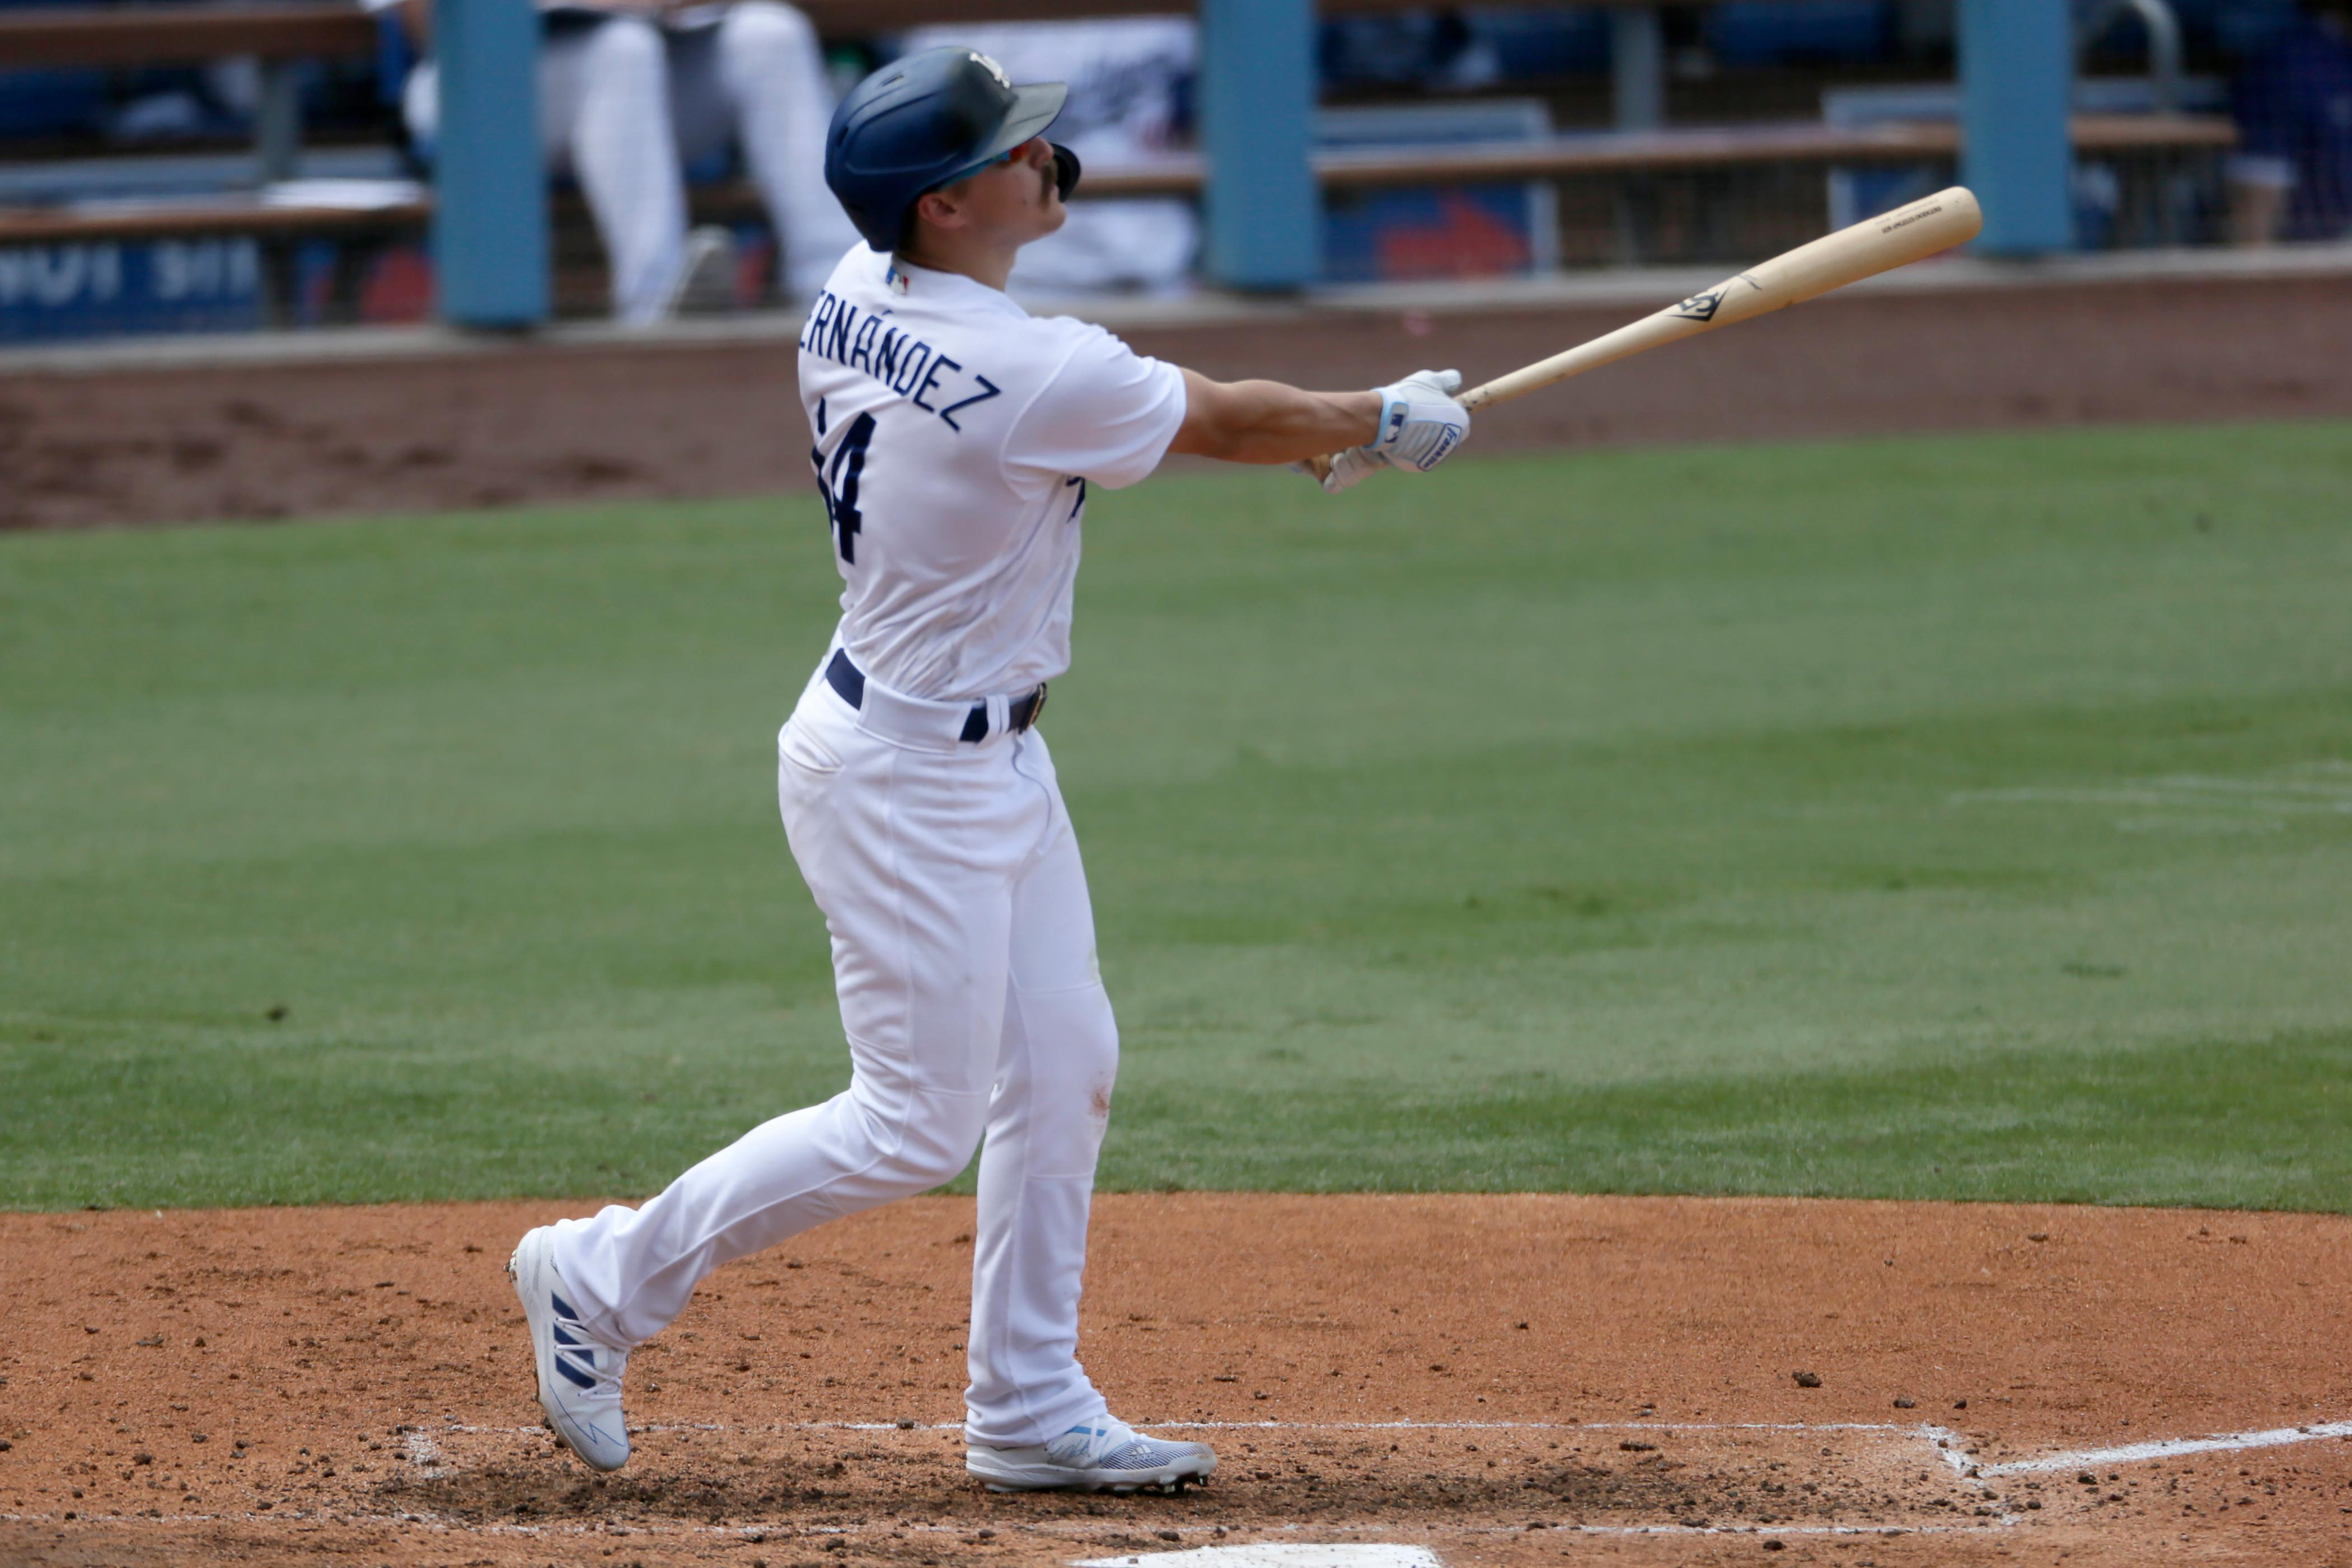 Los Angeles Dodgers' Enrique Hernandez follows through hitting a three-run home run against the Colorado Rockies during the fourth inning of a baseball game in Los Angeles, Sunday, Aug. 23, 2020. (AP Photo/Alex Gallardo)